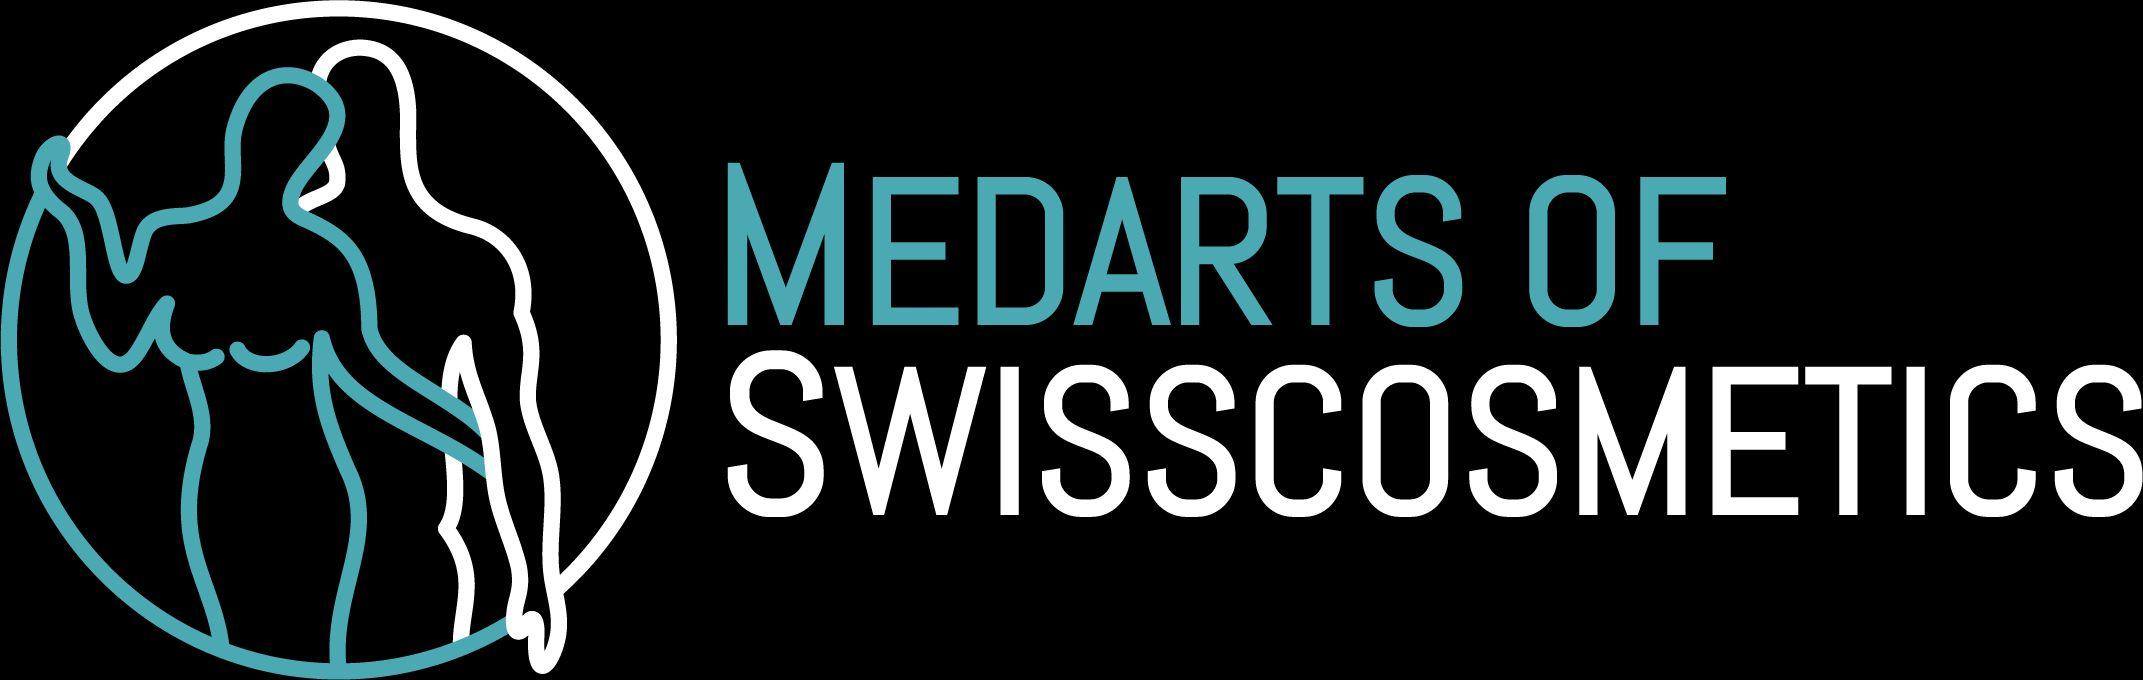 Medarts of Swisscosmetics